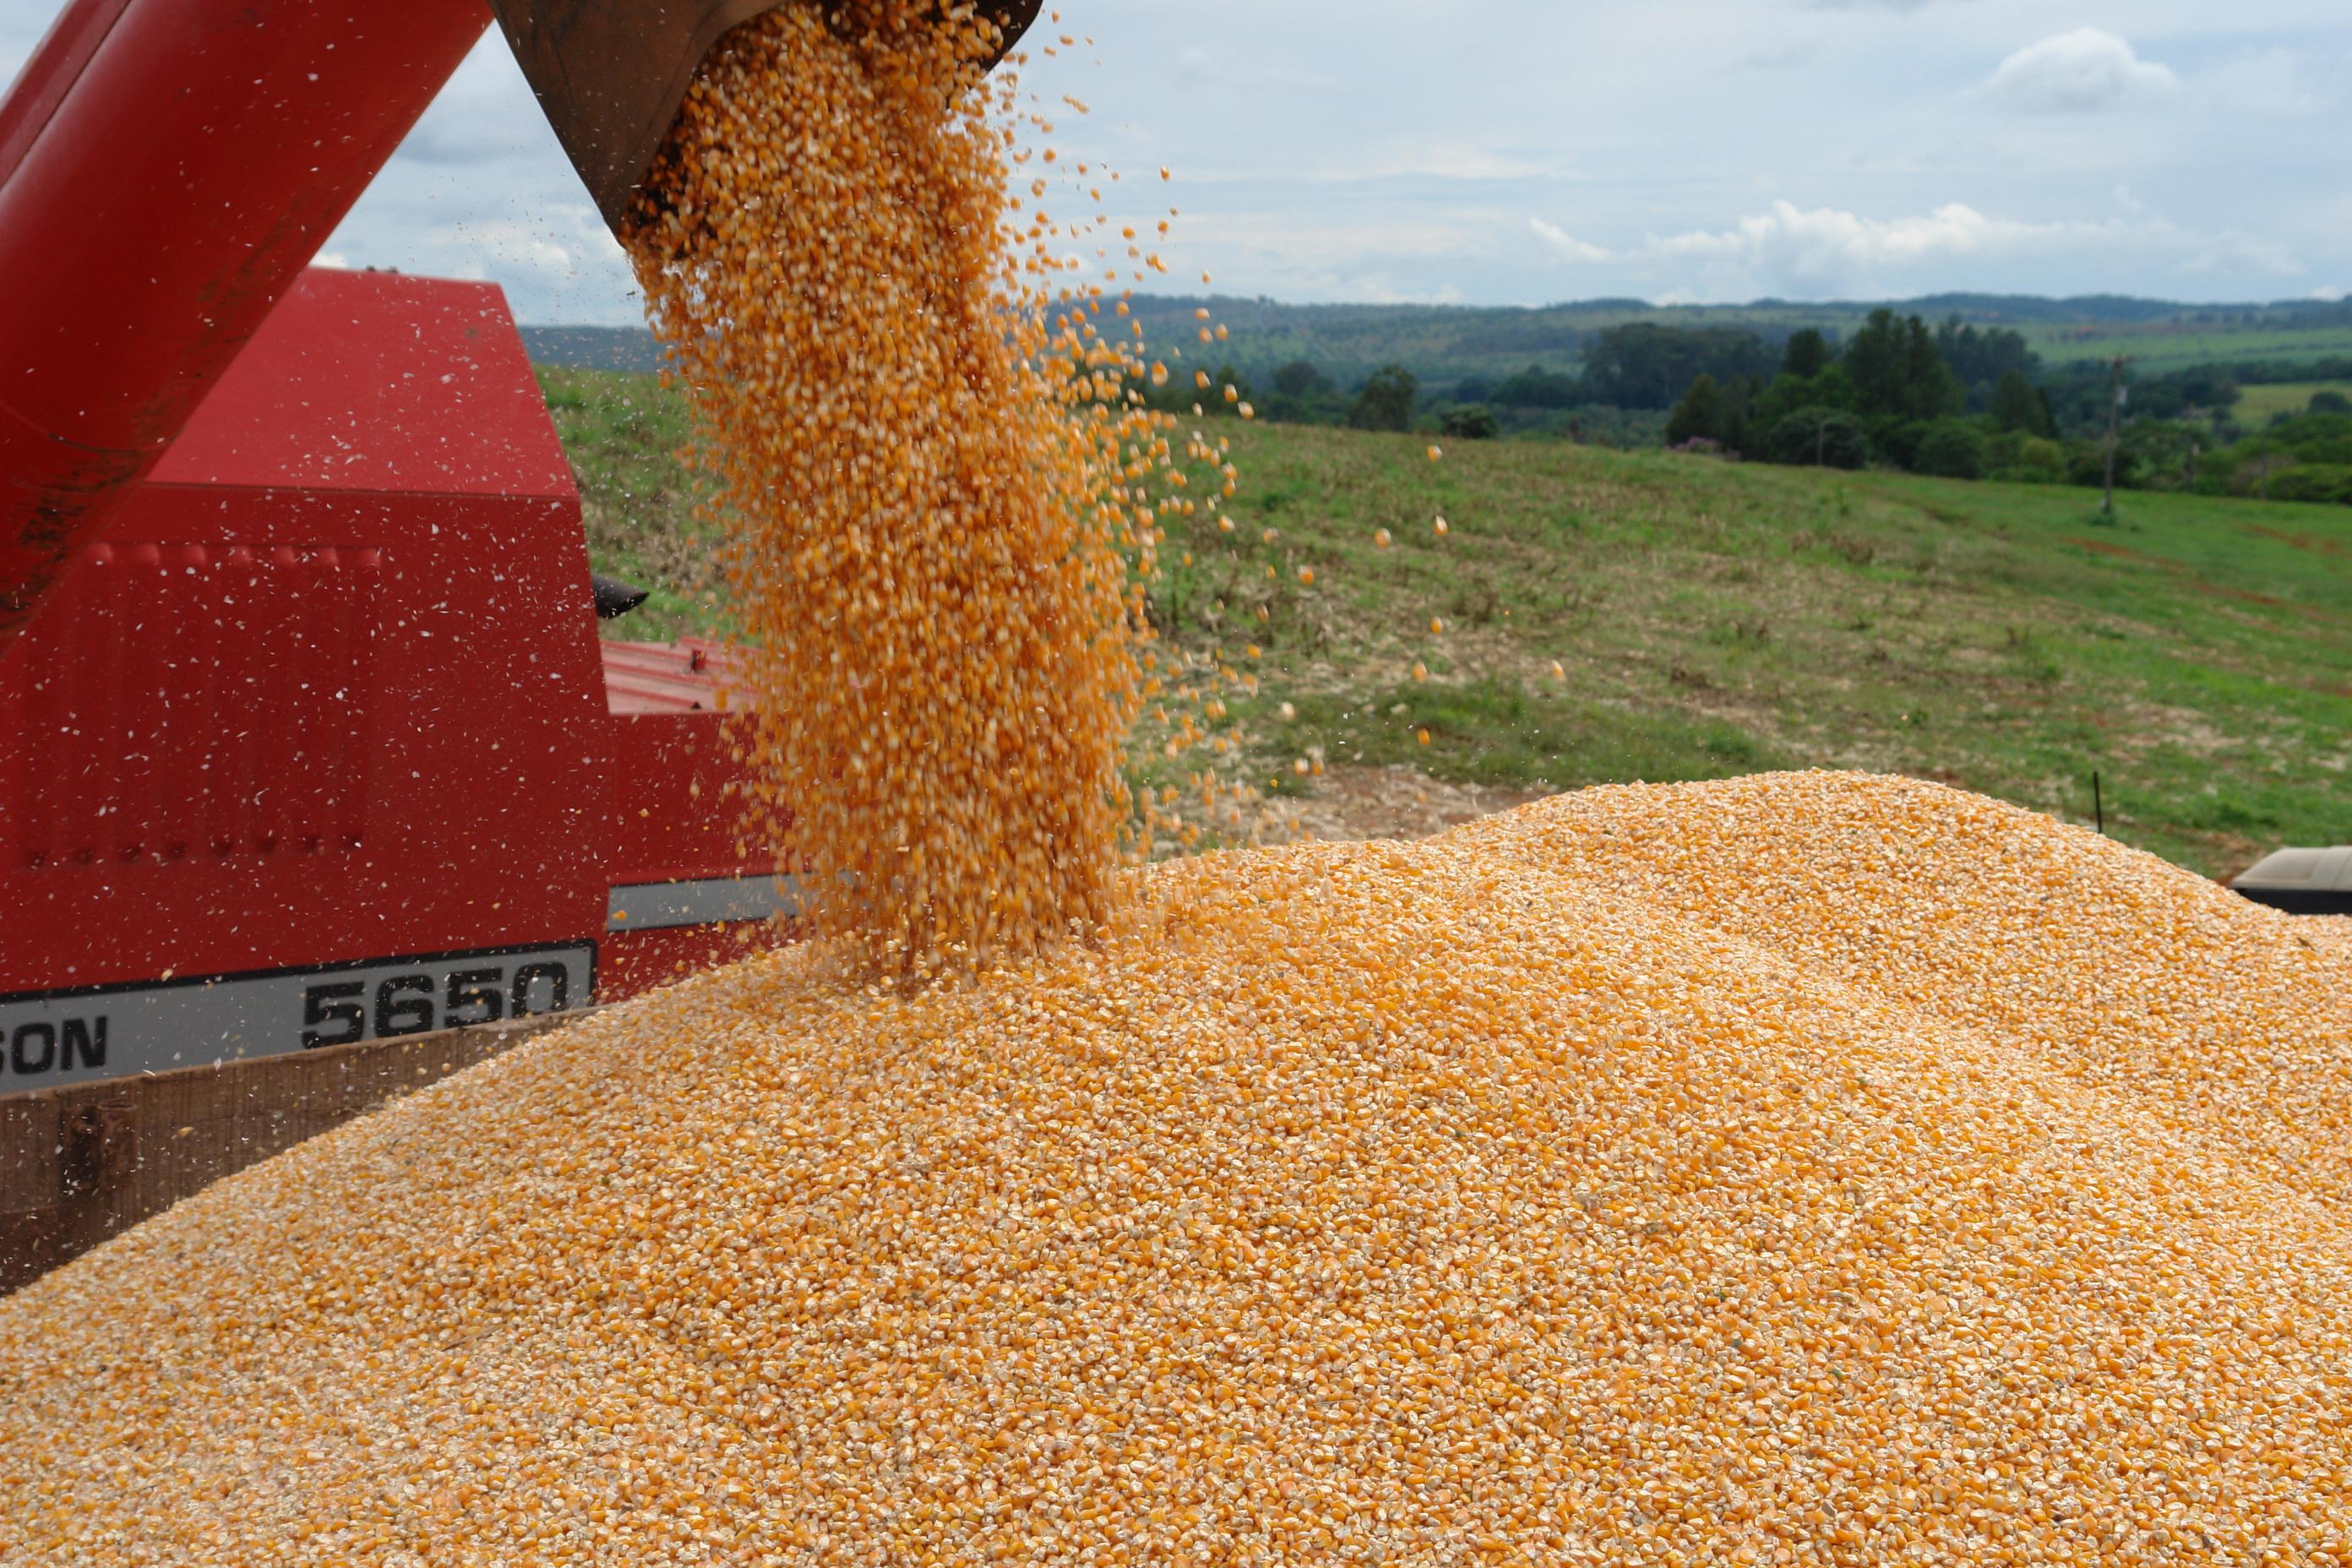 Estado catarinense deve ter safra recorde de grãos neste ano